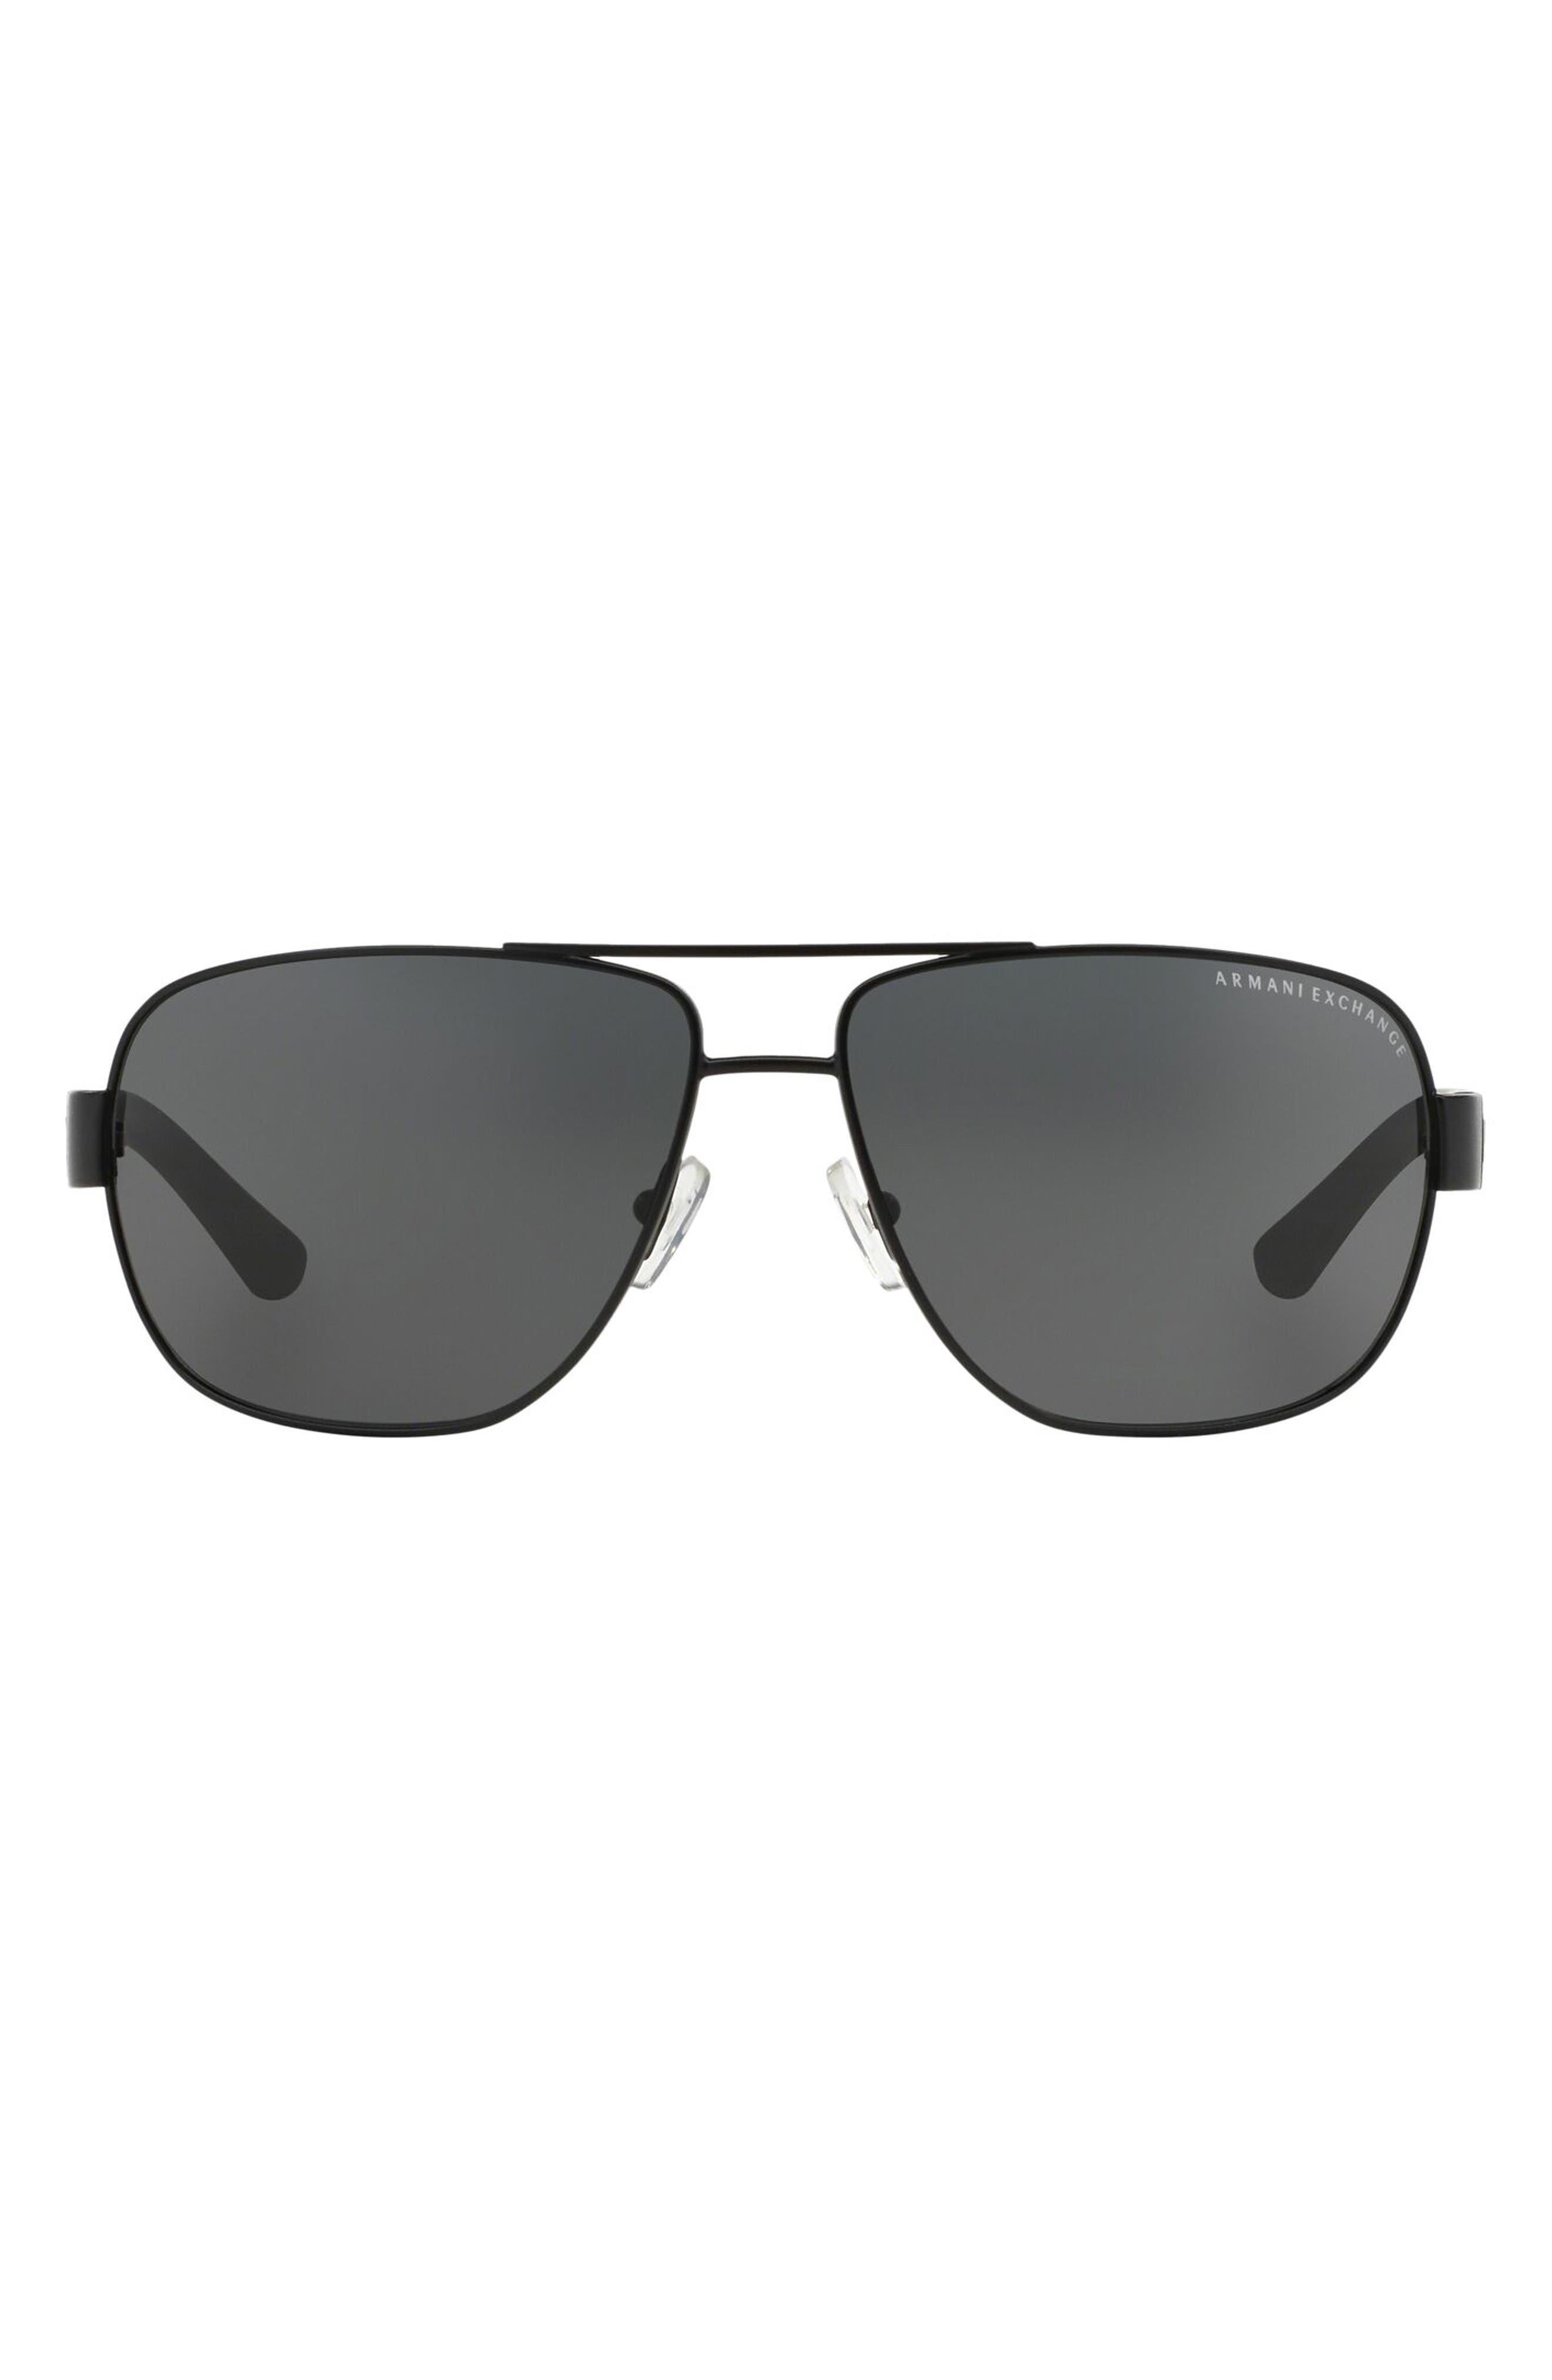 62mm Oversize Pilot Sunglasses